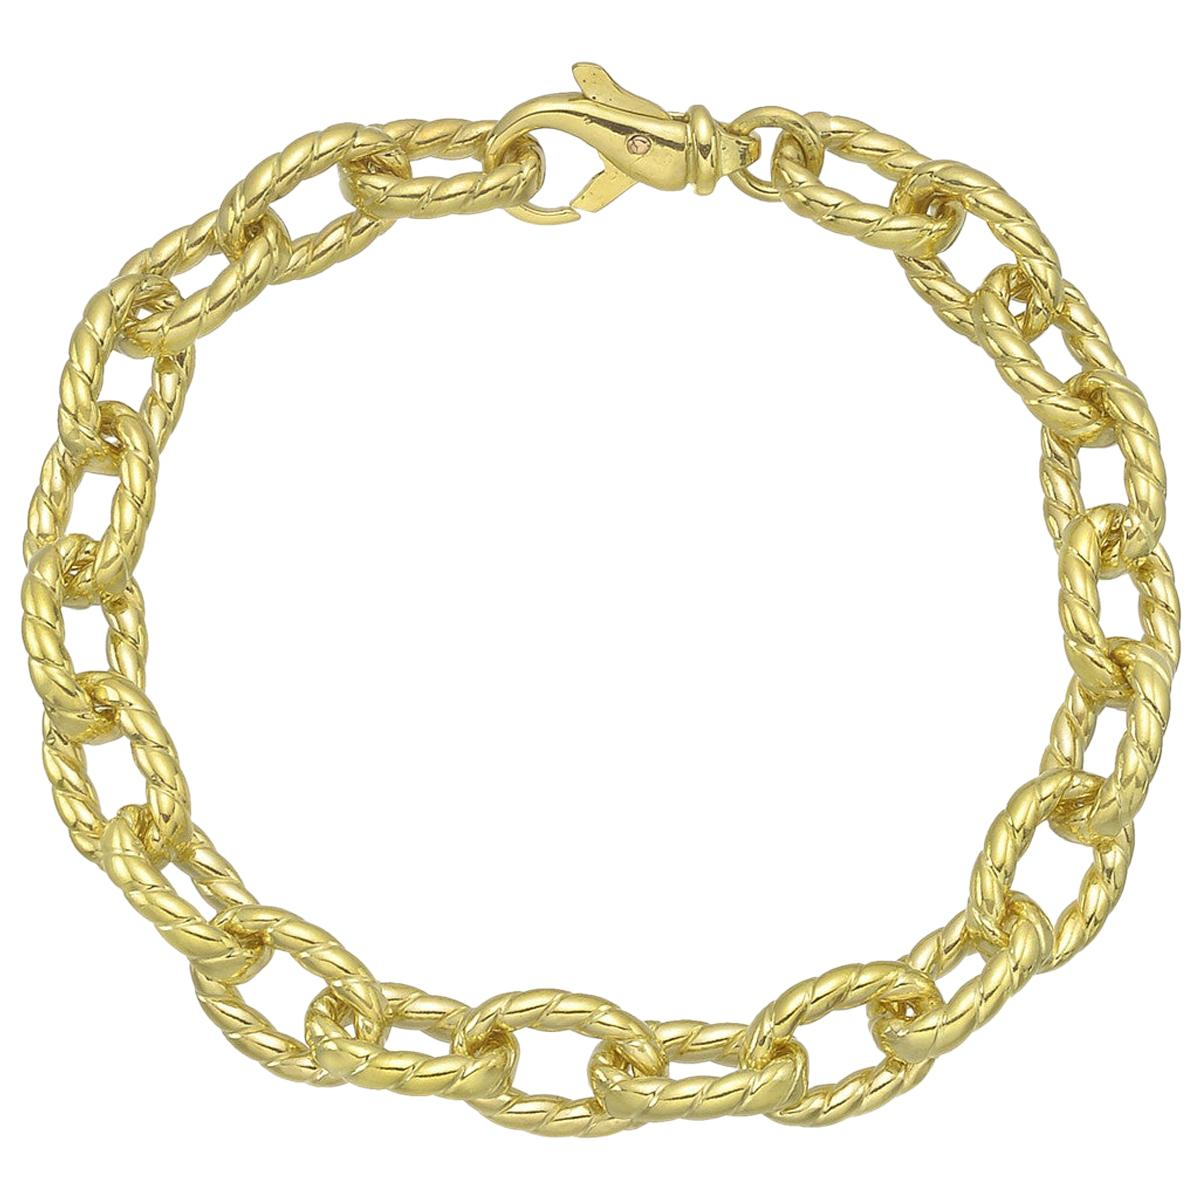 18 Karat Yellow Gold Oval Twist Link Bracelet